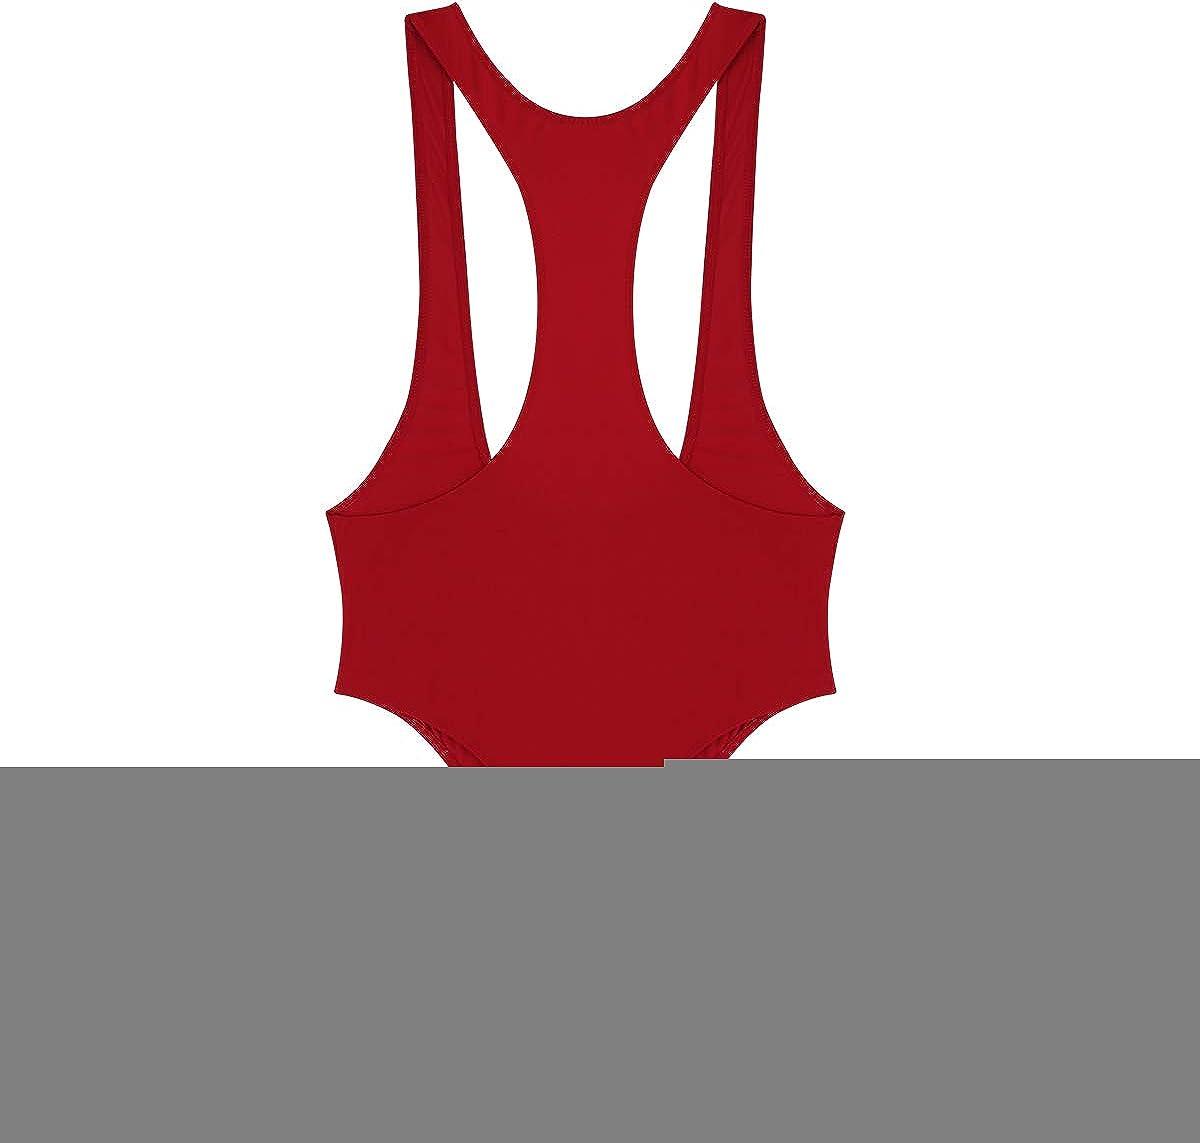 Yeahdor Womens One Piece High Cut Thong Leotard Sleeveless Open Chest Bodysuit Teddy Swimwear